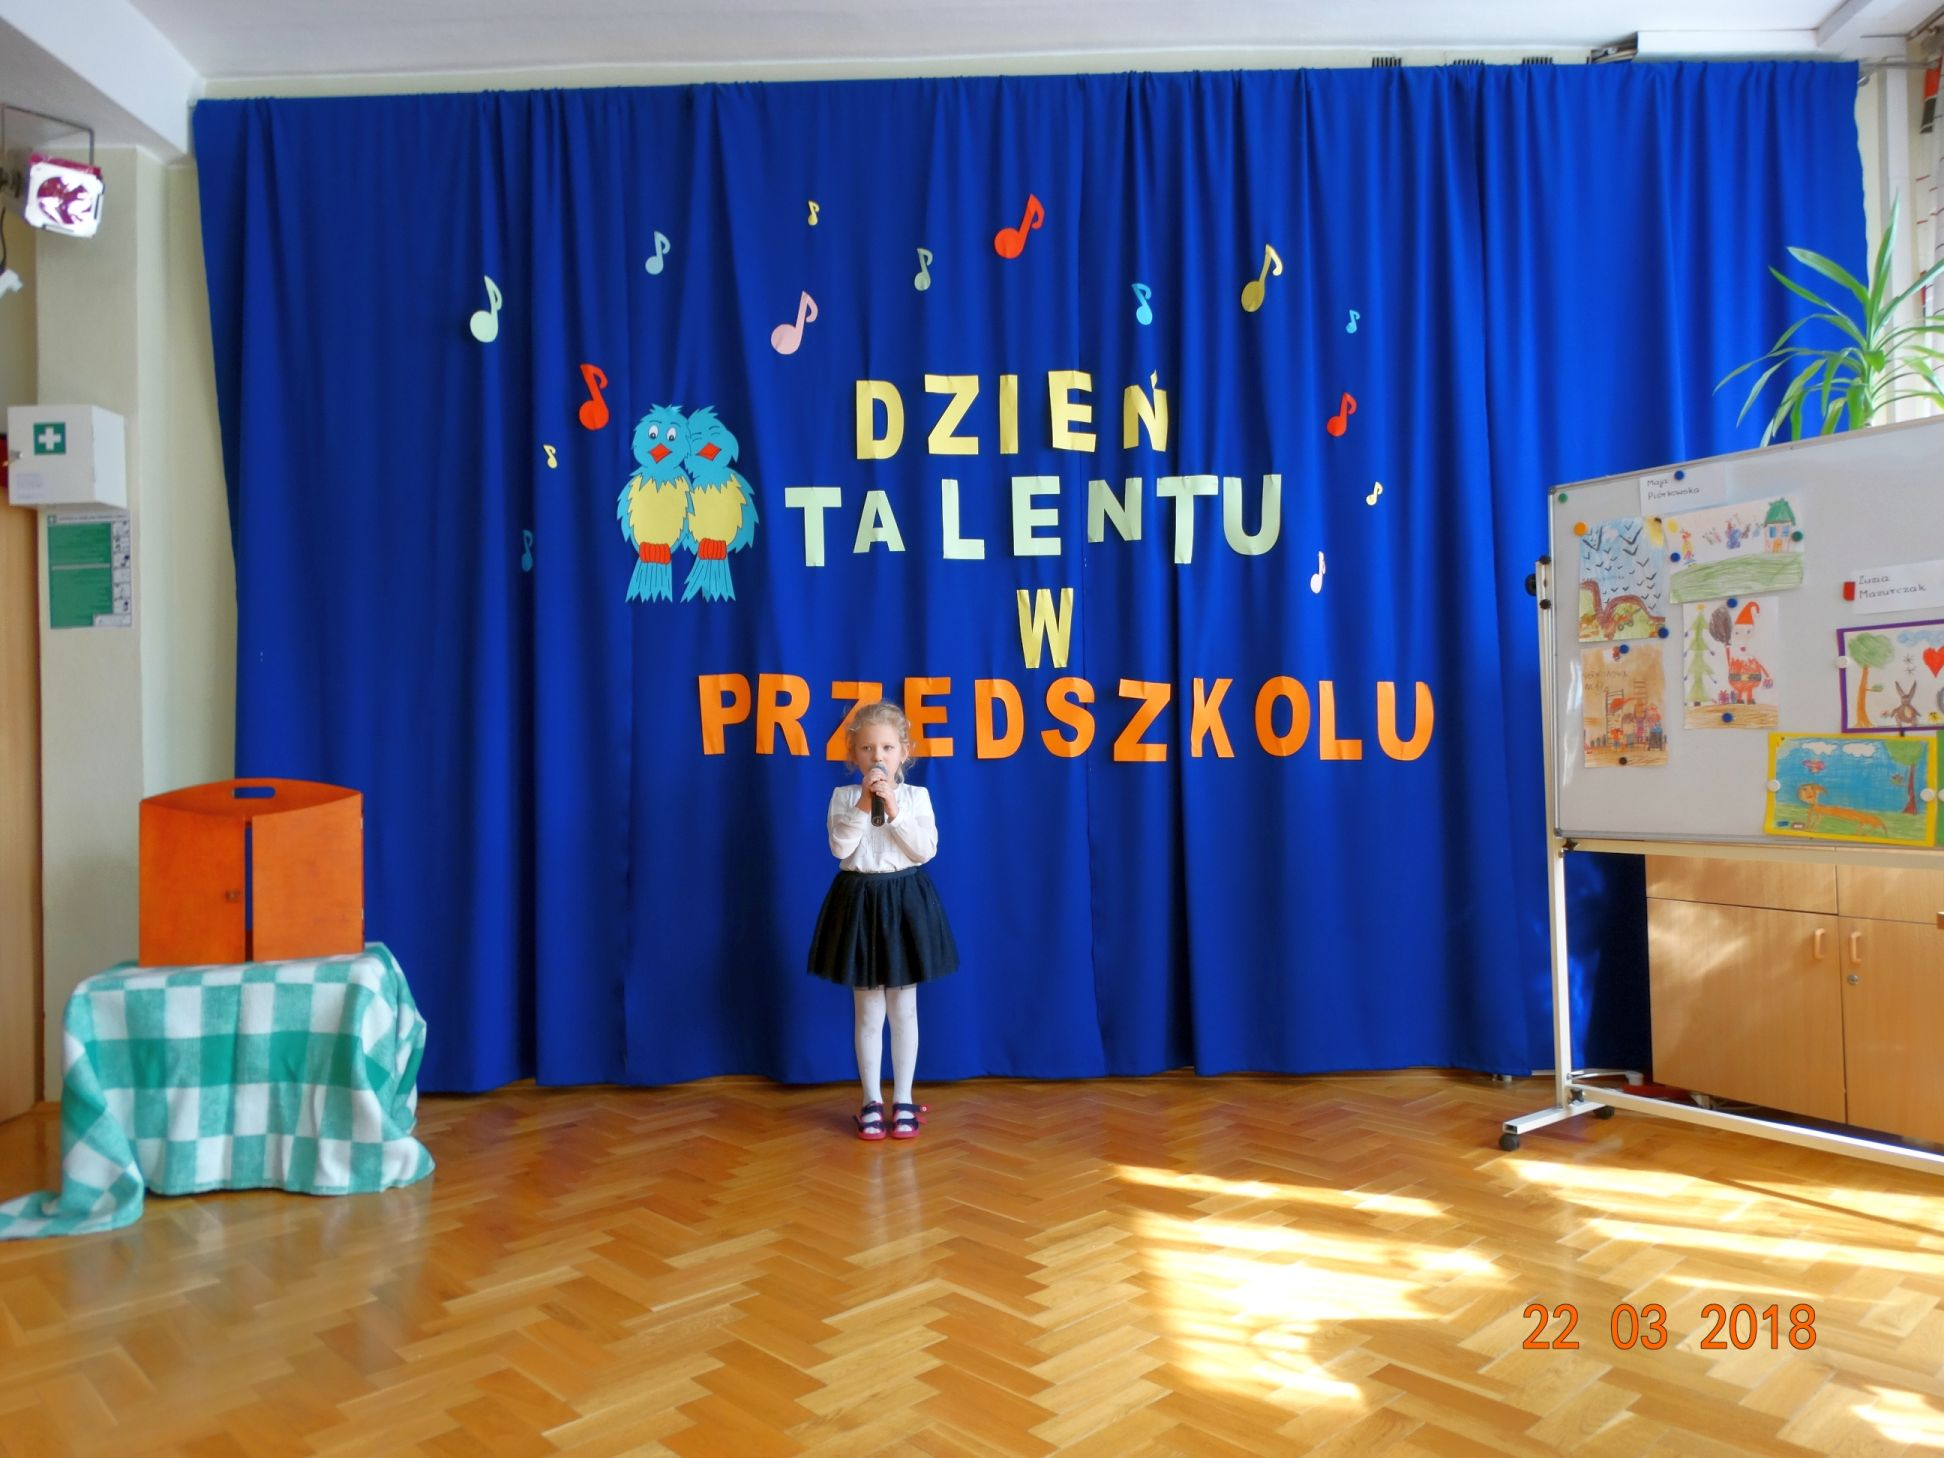 Dzien talentow 2018 (3)